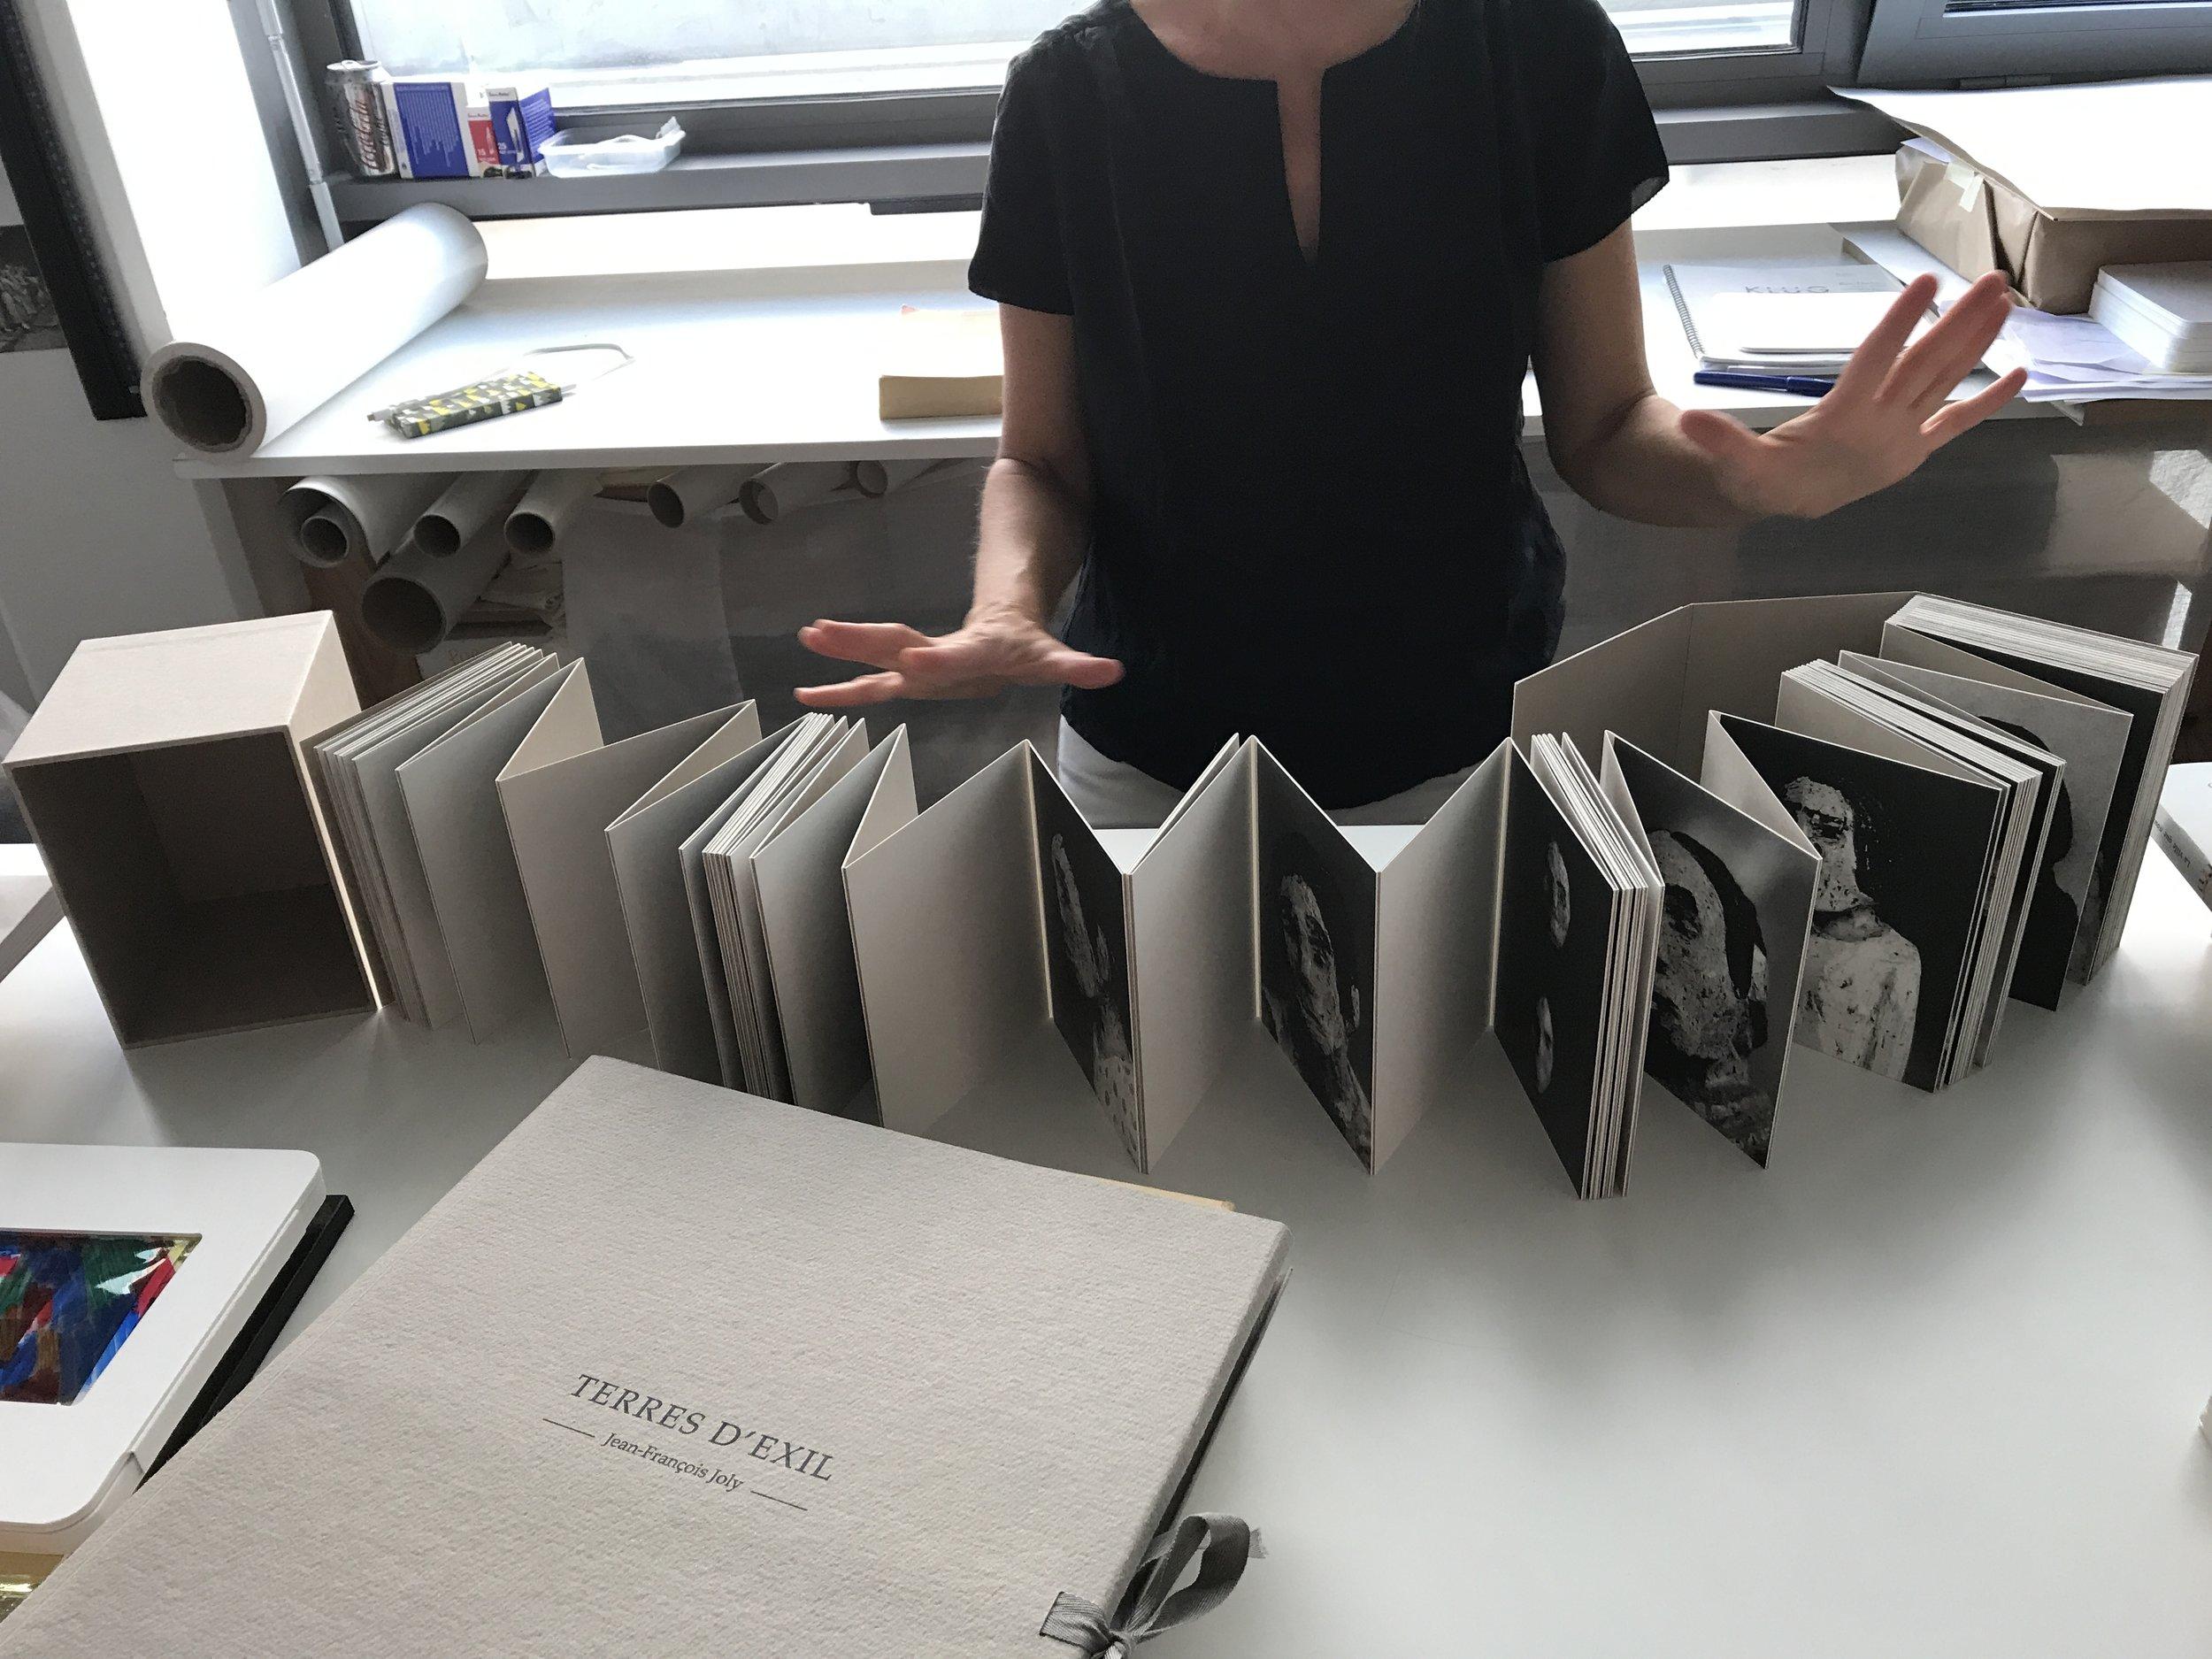 Visit to Laurel Parker Bookbinding studio